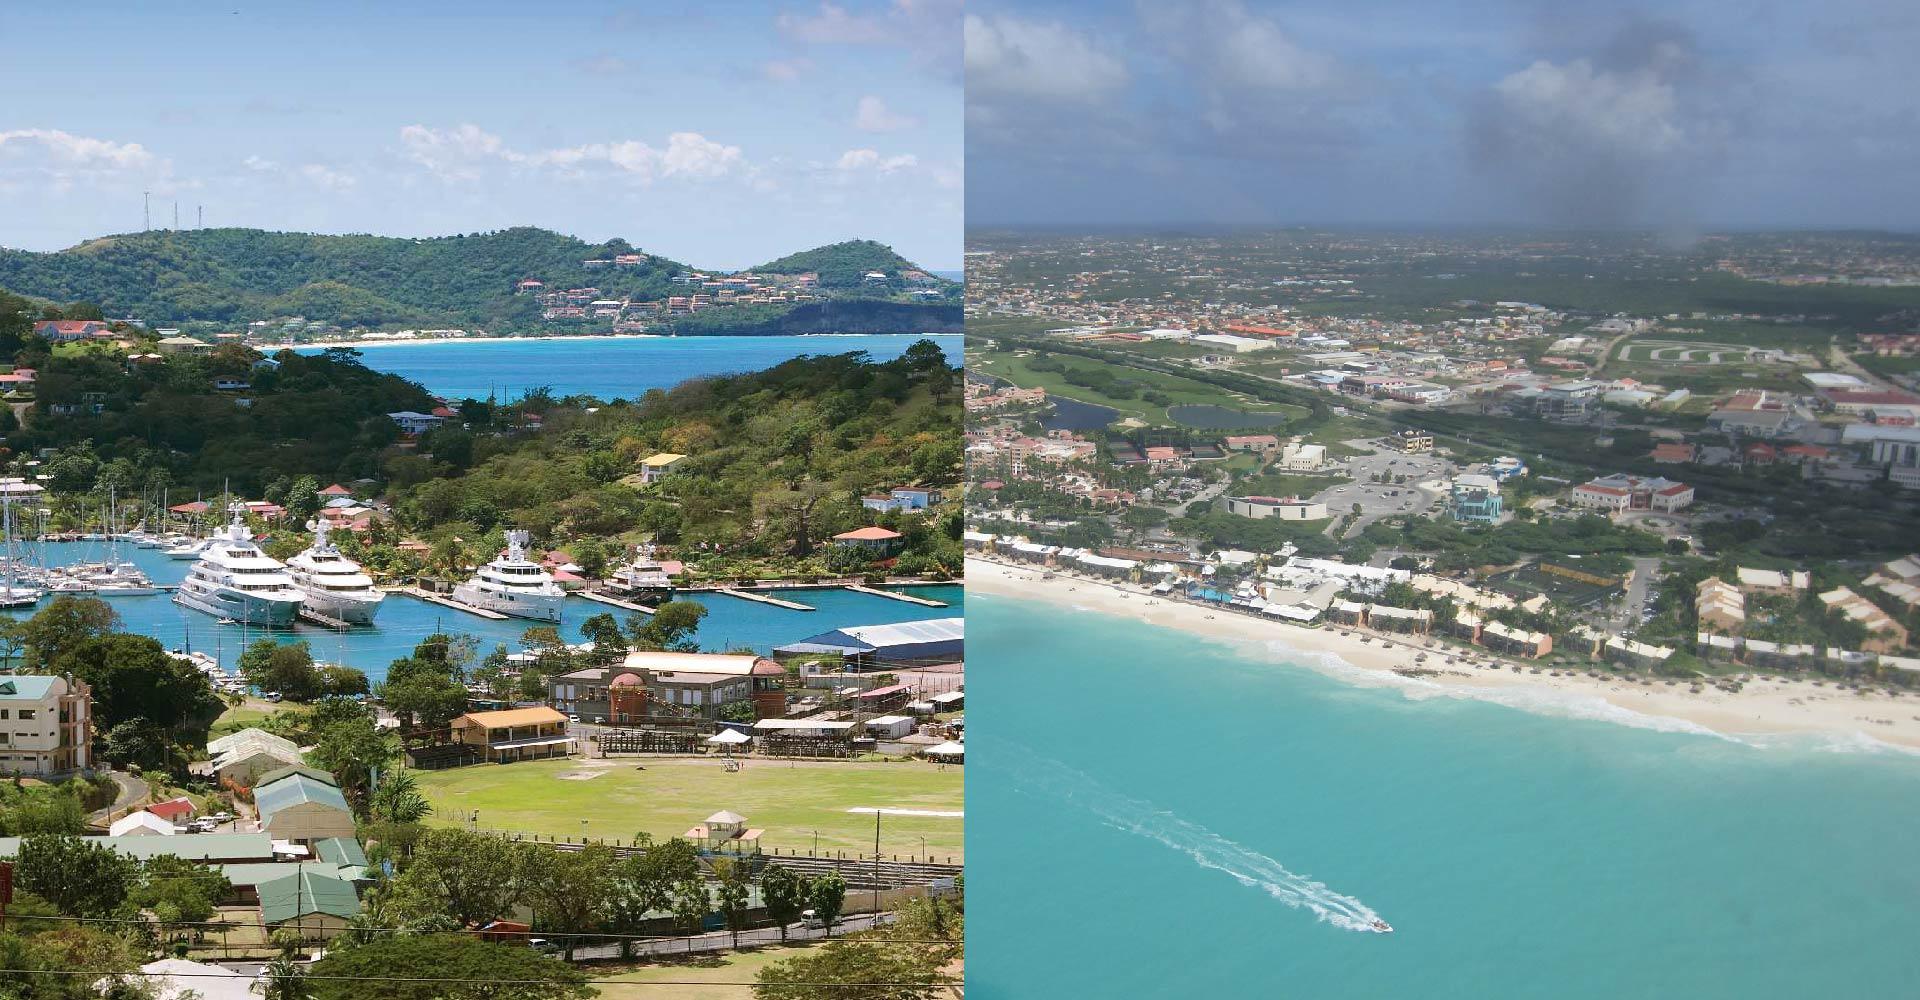 Grenada's landscape on the left and Aruba's landscape on the right